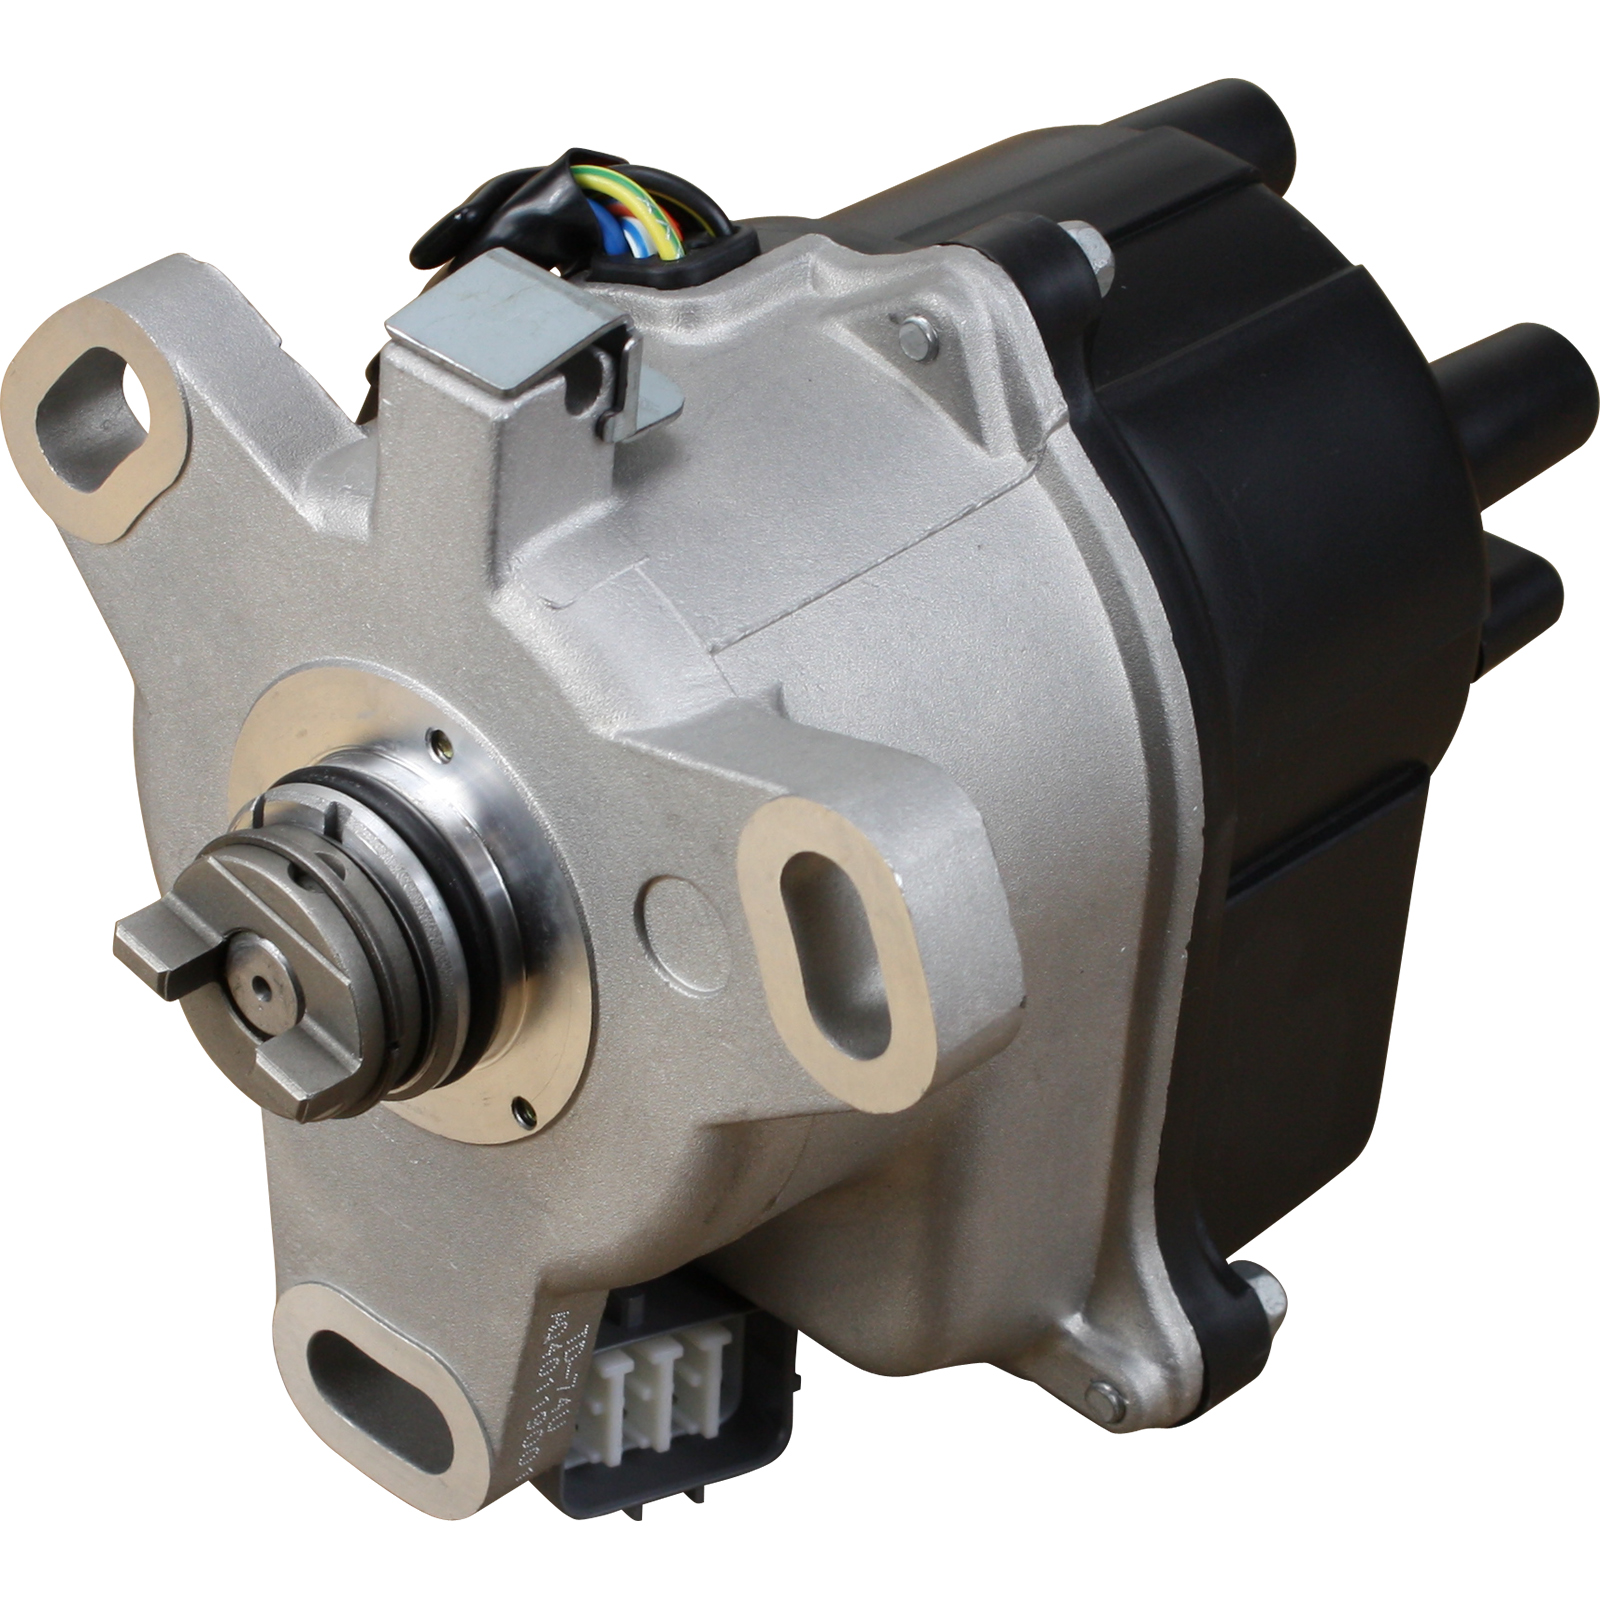 Ignition Distributor for 1997-2000 Honda CR-V 2.0L L4 with TEC 74U 30100-P6T-T01